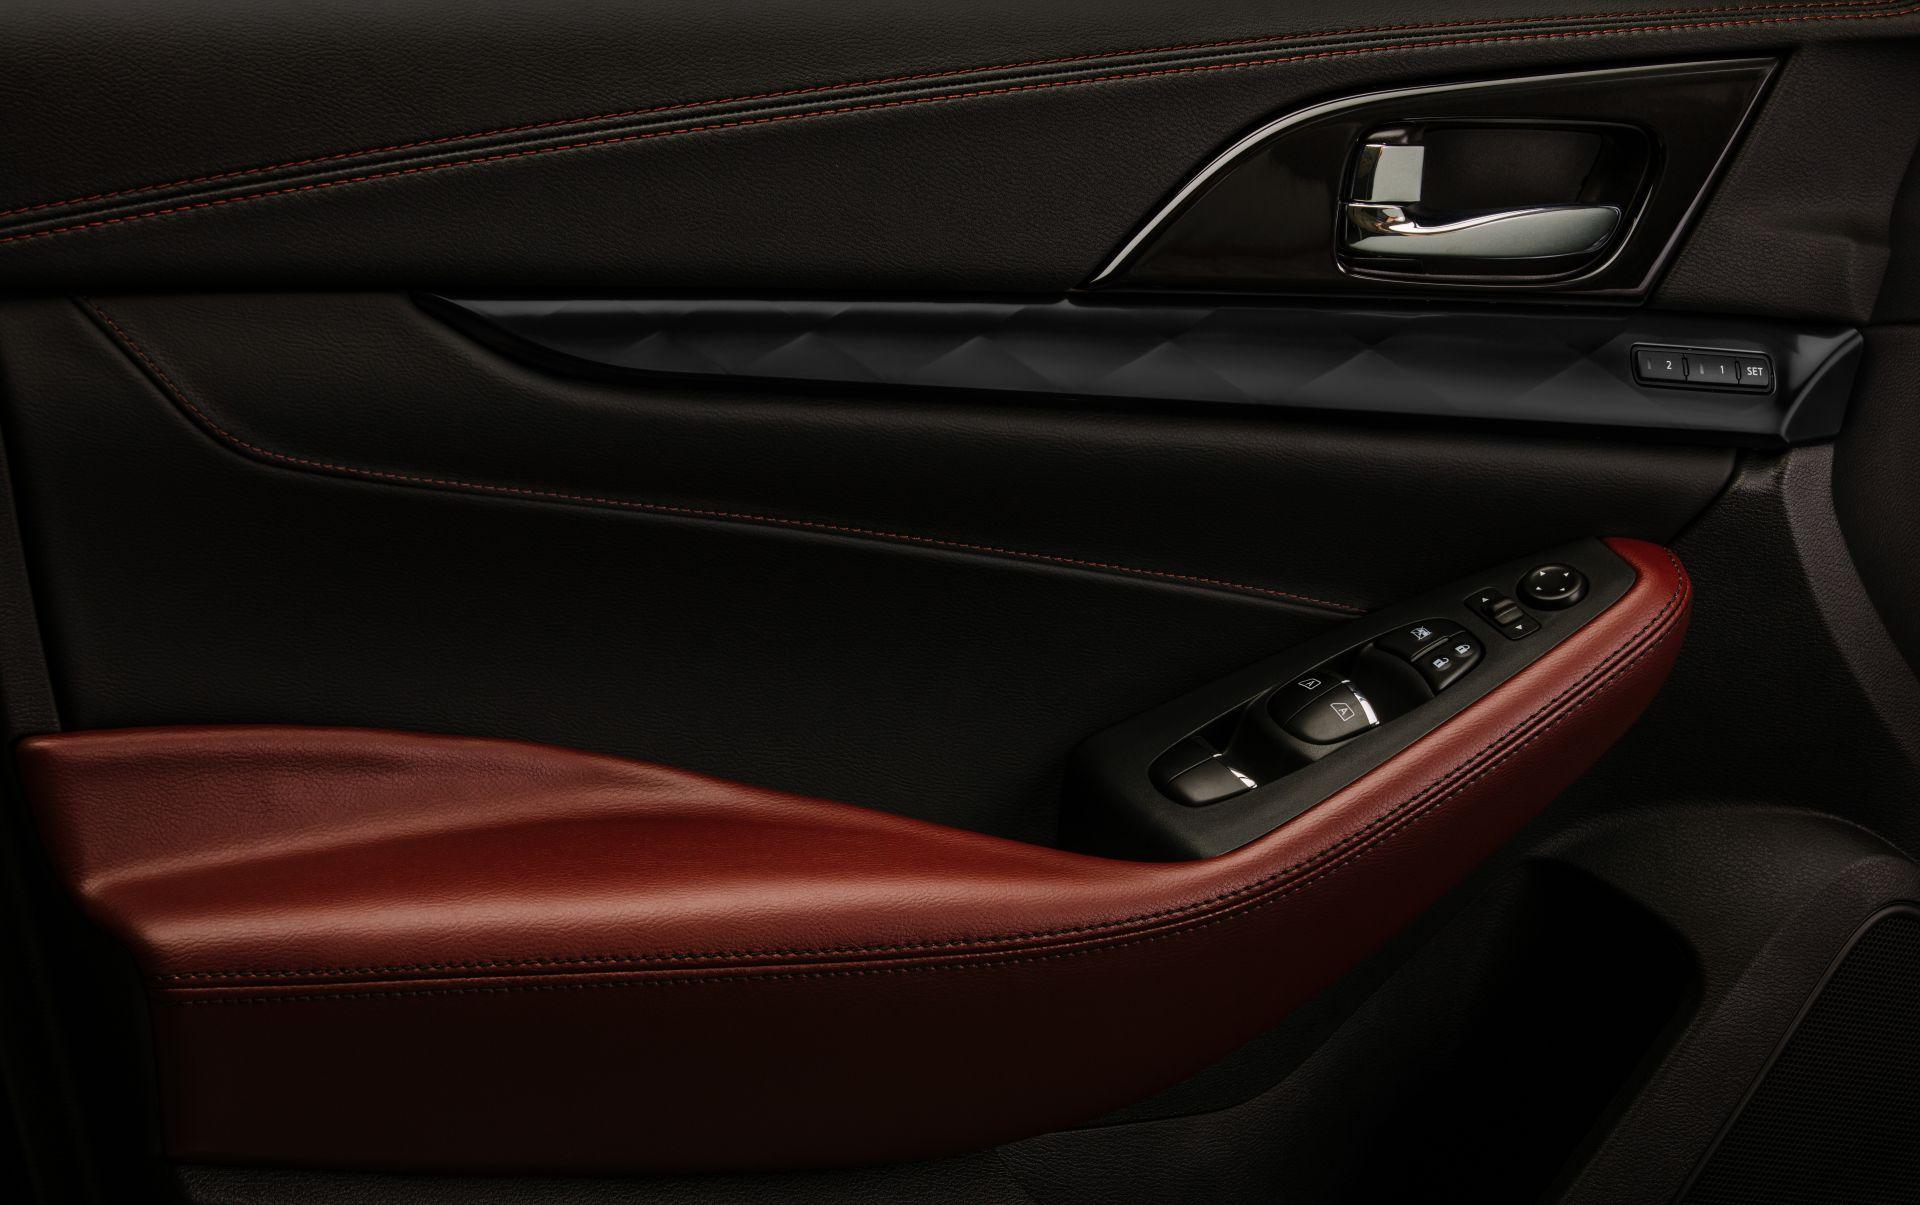 Nissan-Maxima-40th-Anniversary-Edition-17